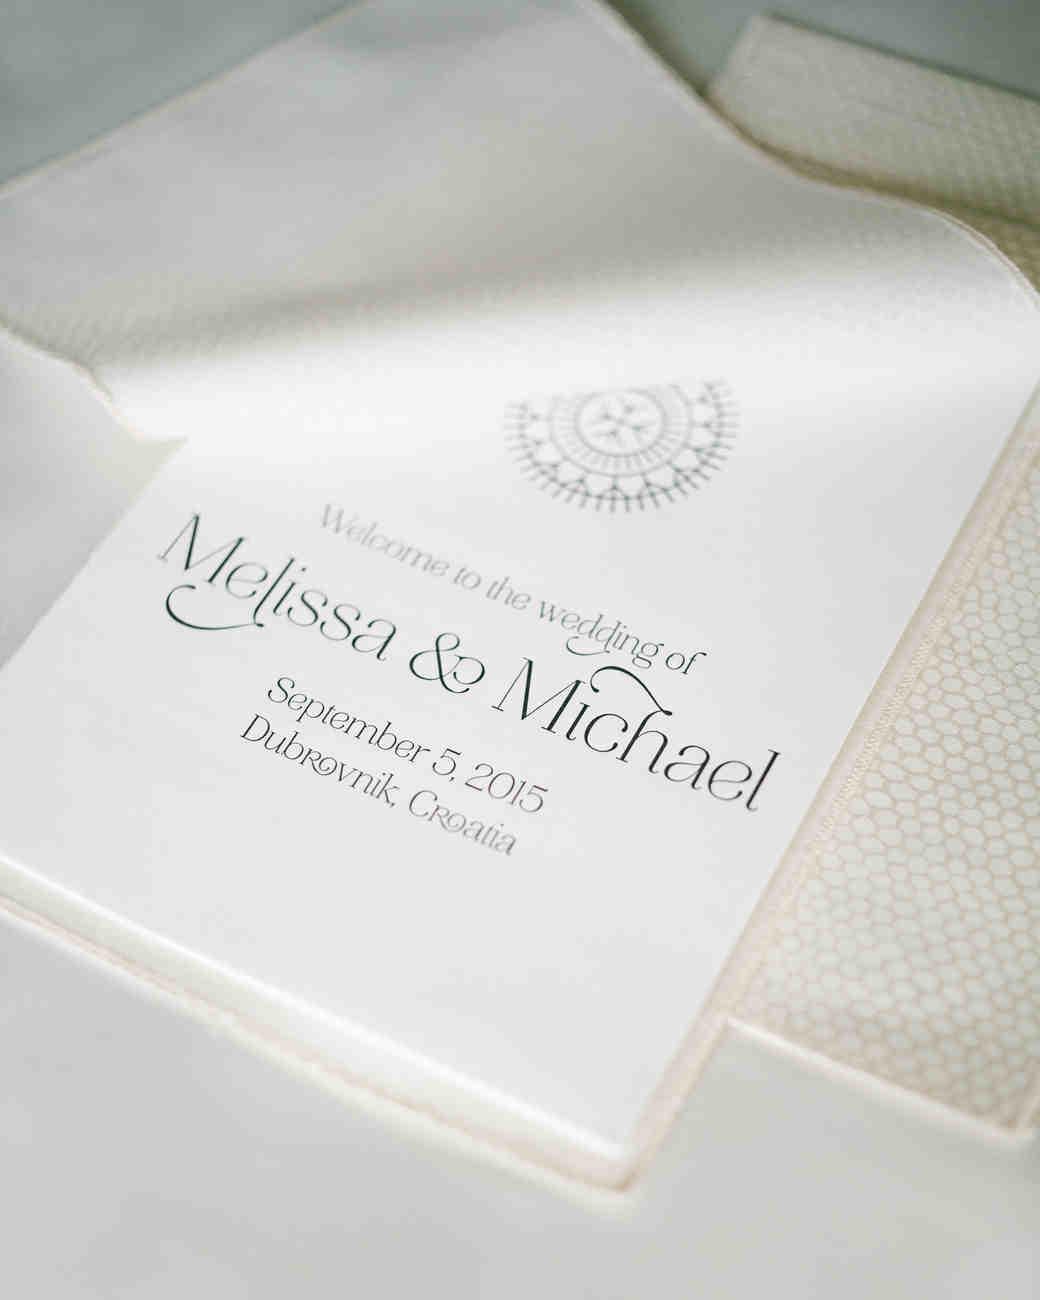 melissa-mike-wedding-program-0105-s112764-0316.jpg